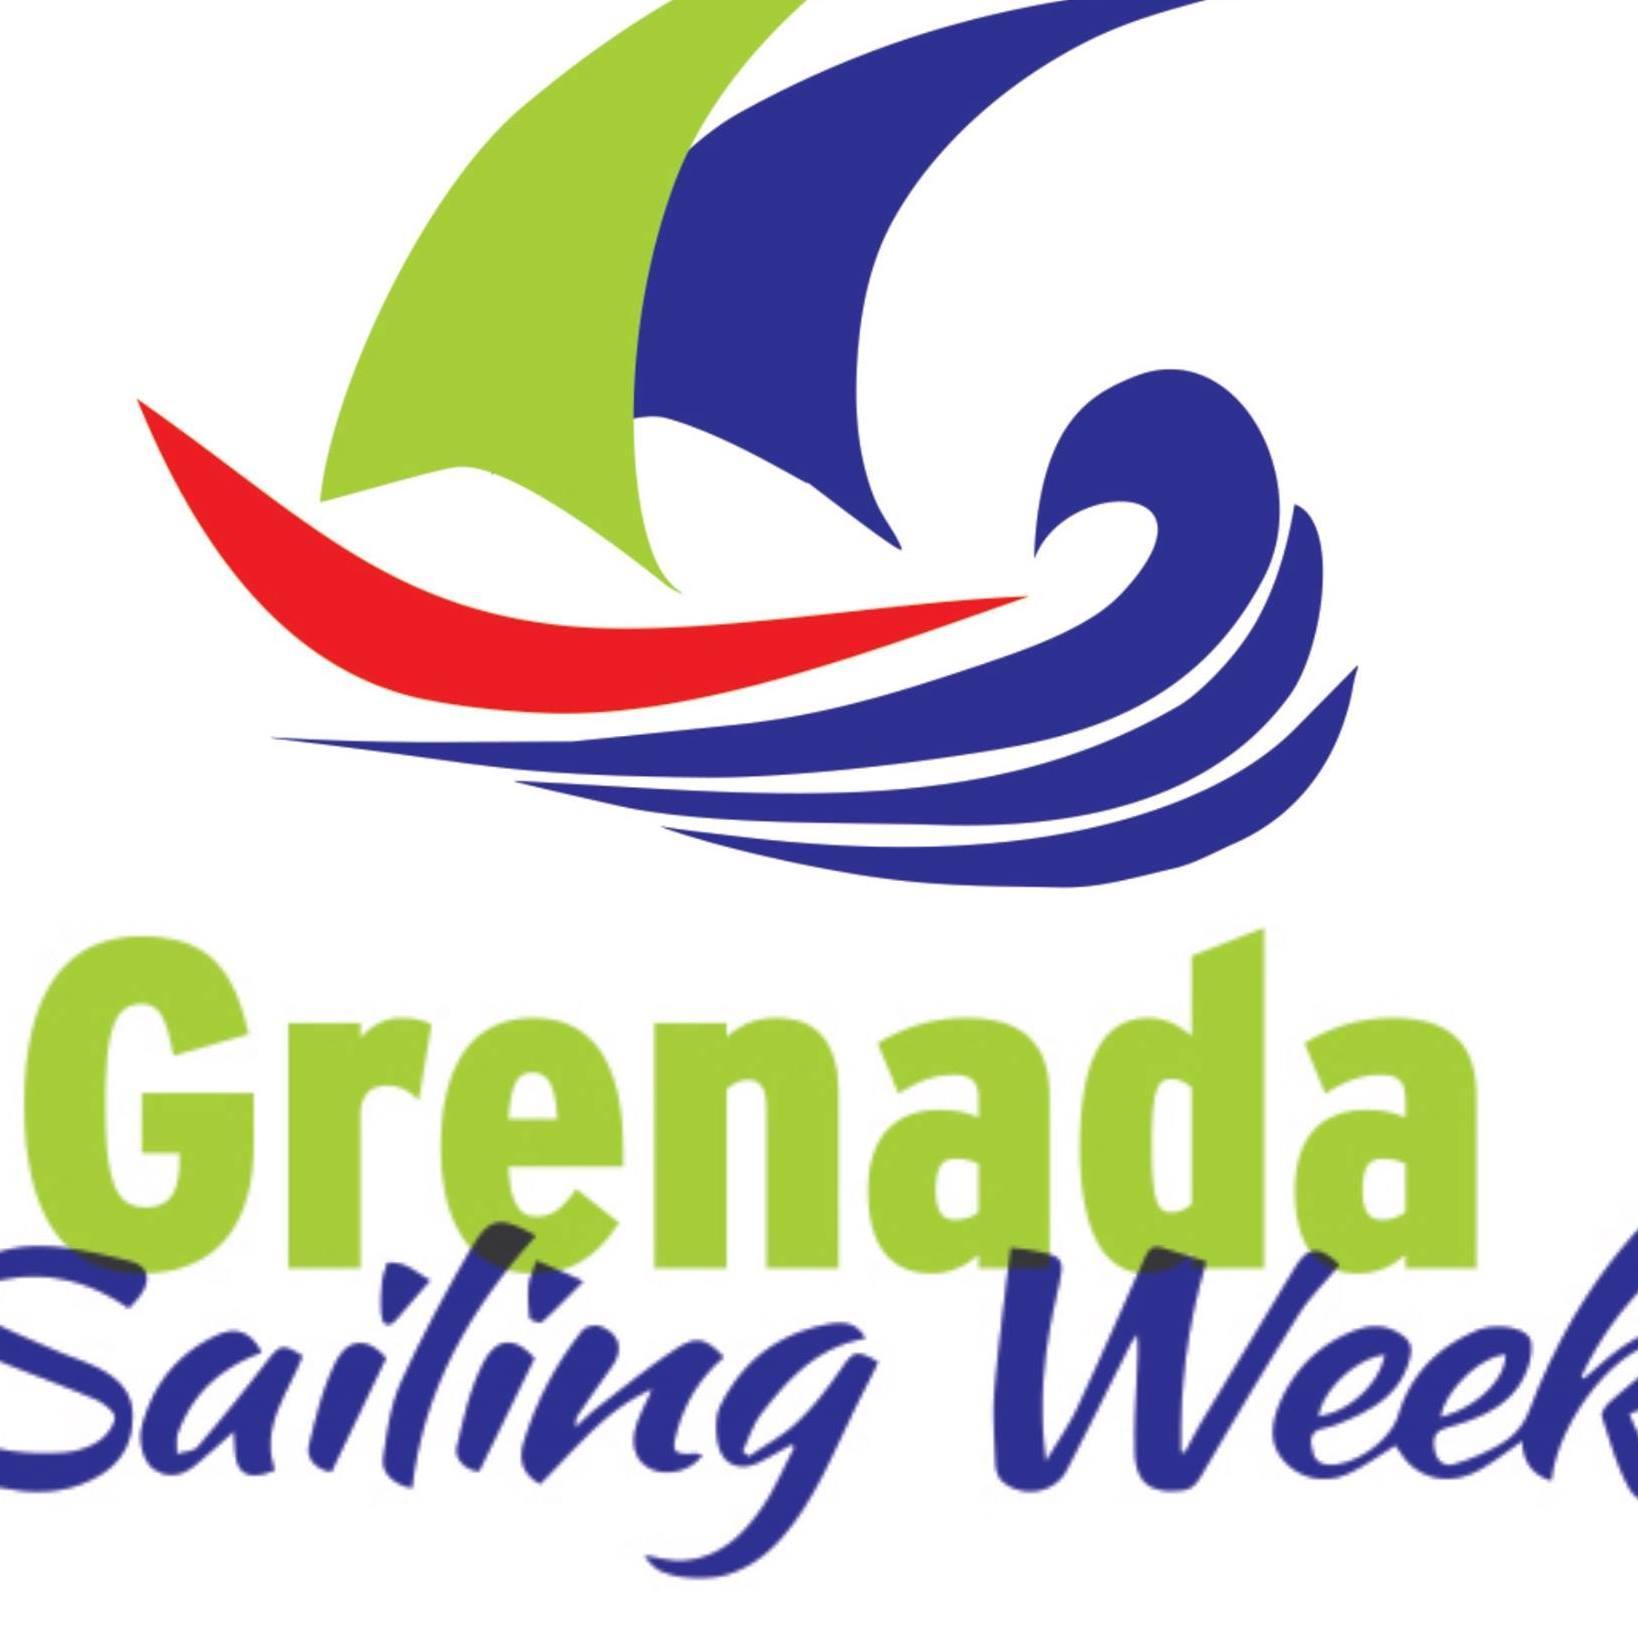 Grenada-Sailing-Week